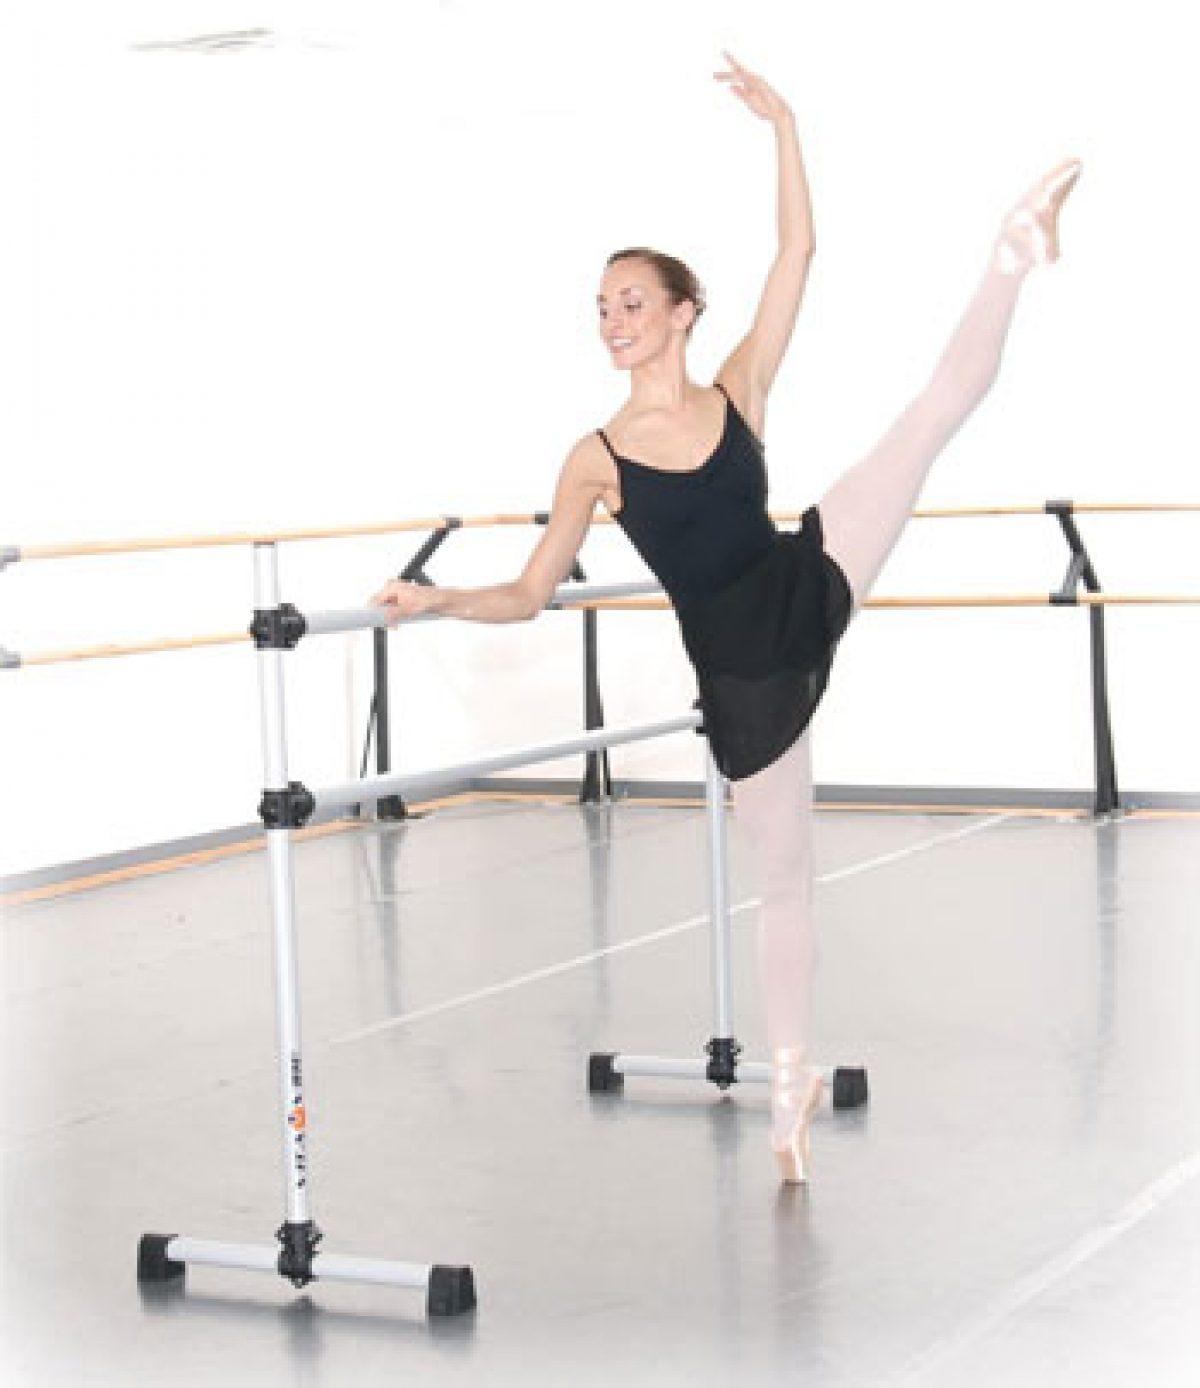 Fitness Ballet Bar ABORON 4x4ft Ballet Barre Portable Freestanding Double Ballet Barre Adjustable Dancing Stretching Ballet for Home,Dance Barre